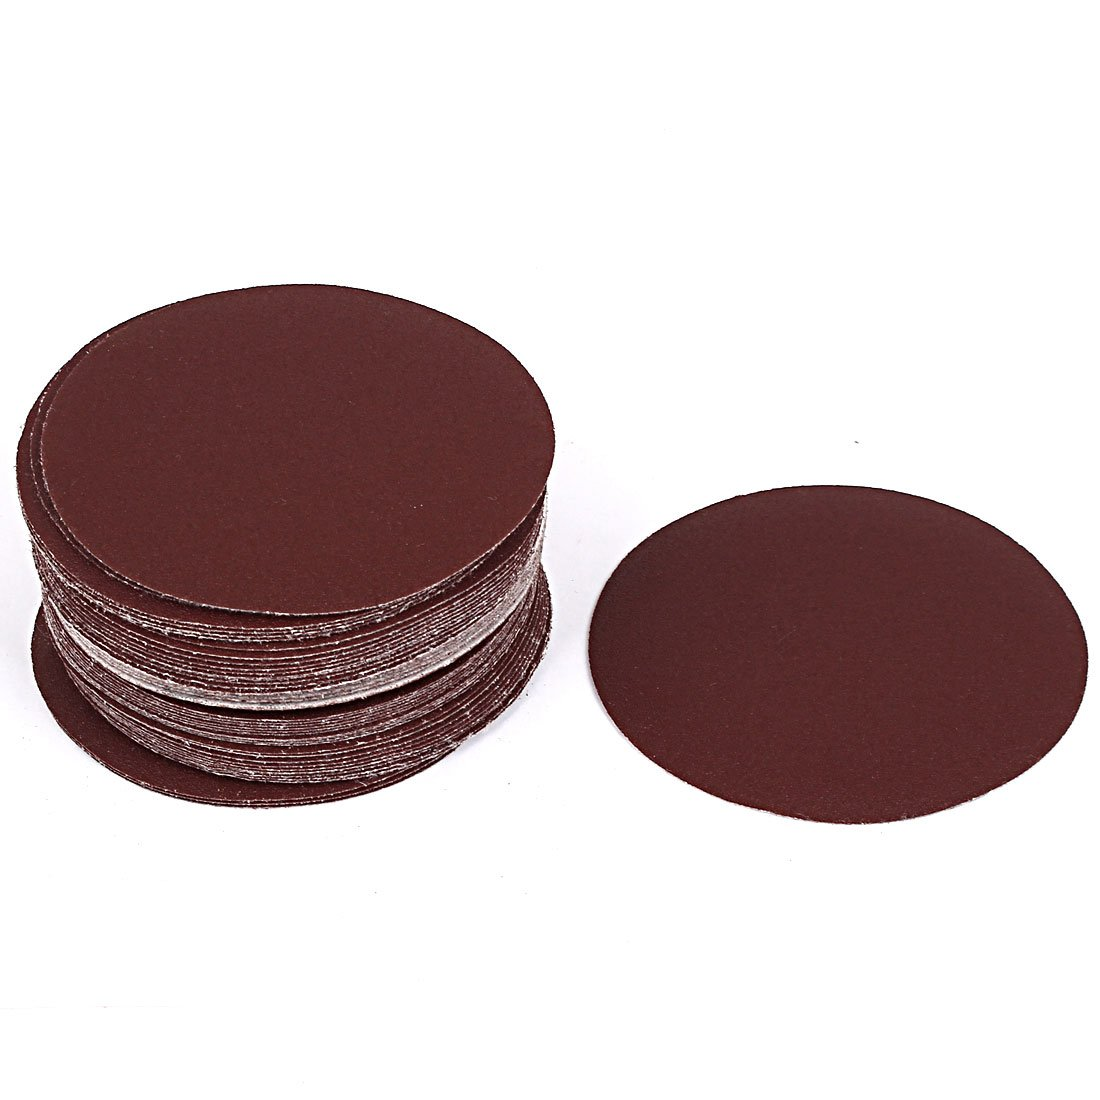 uxcell 4inch Dia Polishing Abrasive Sanding Flocking Sandpaper Disc 150 Grit 50 Pcs